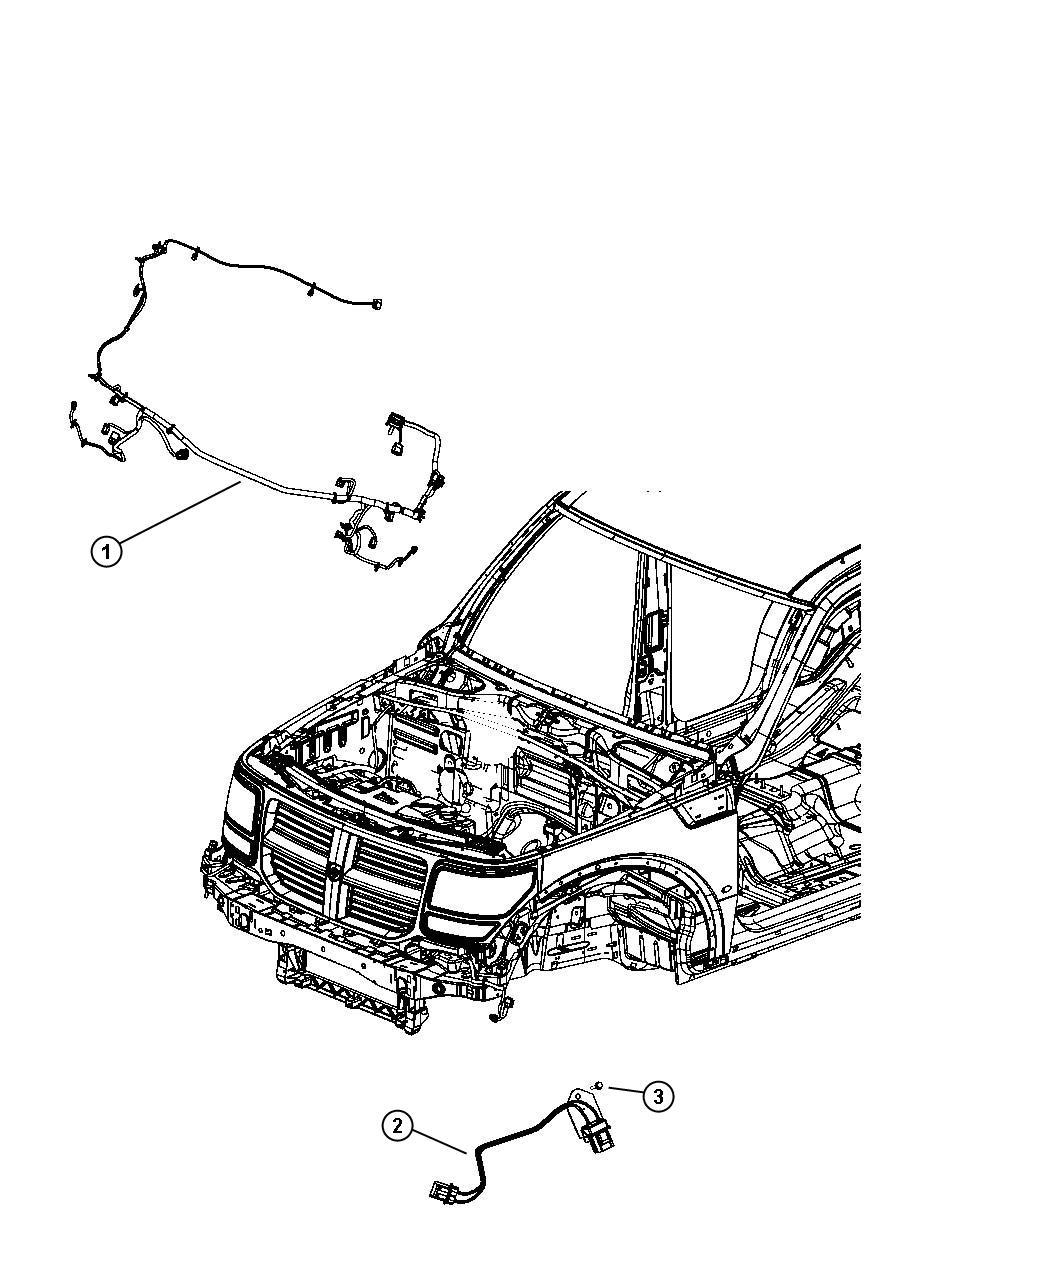 Jeep Wrangler Wiring Fan Motor Contains Resistor Kit